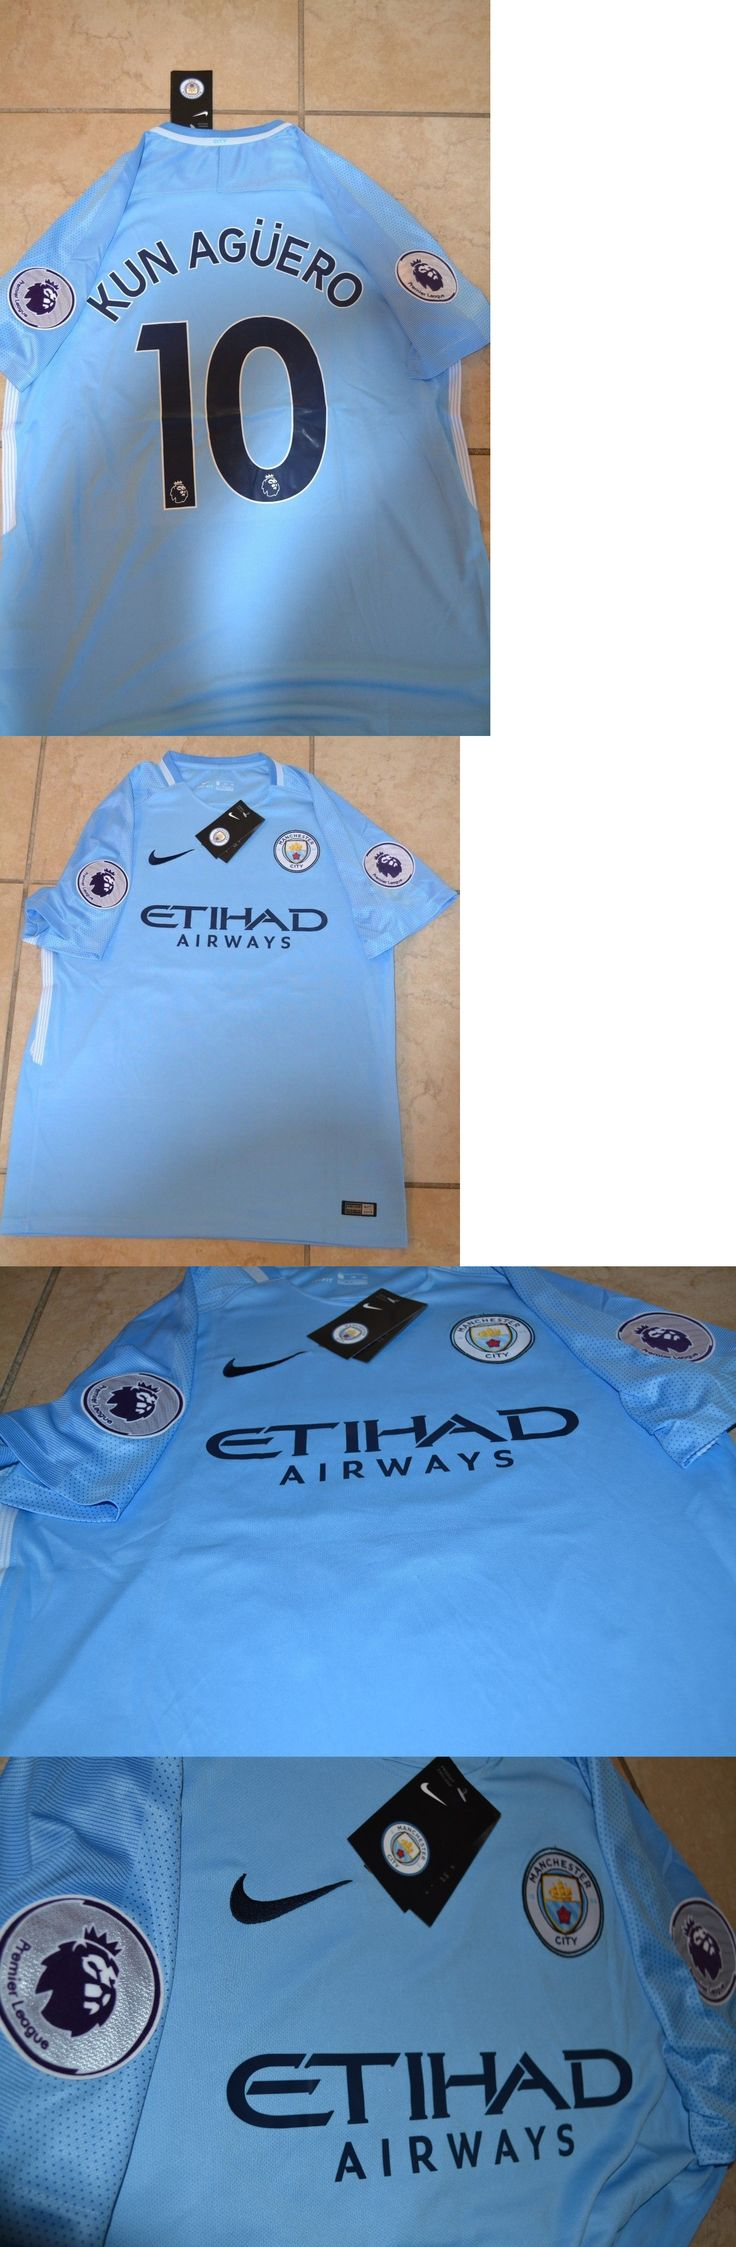 Soccer-International Clubs 2887: Kun Aguero #10 Manchester City Home Soccer Jersey -> BUY IT NOW ONLY: $44.99 on eBay!